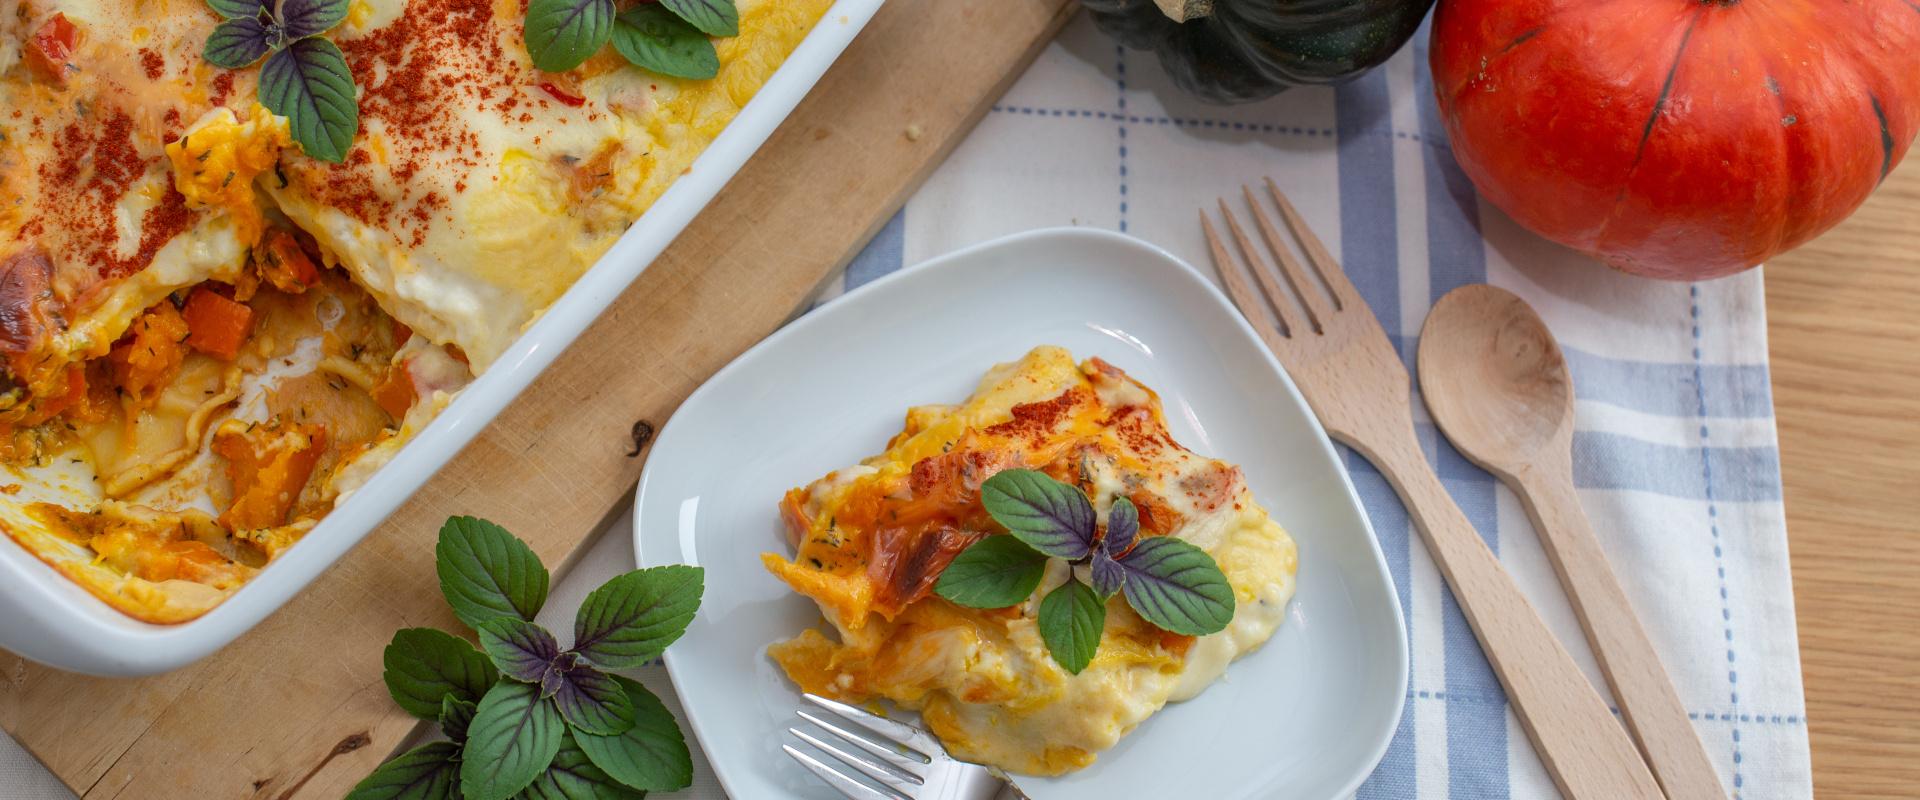 sütőtökös lasagne cover